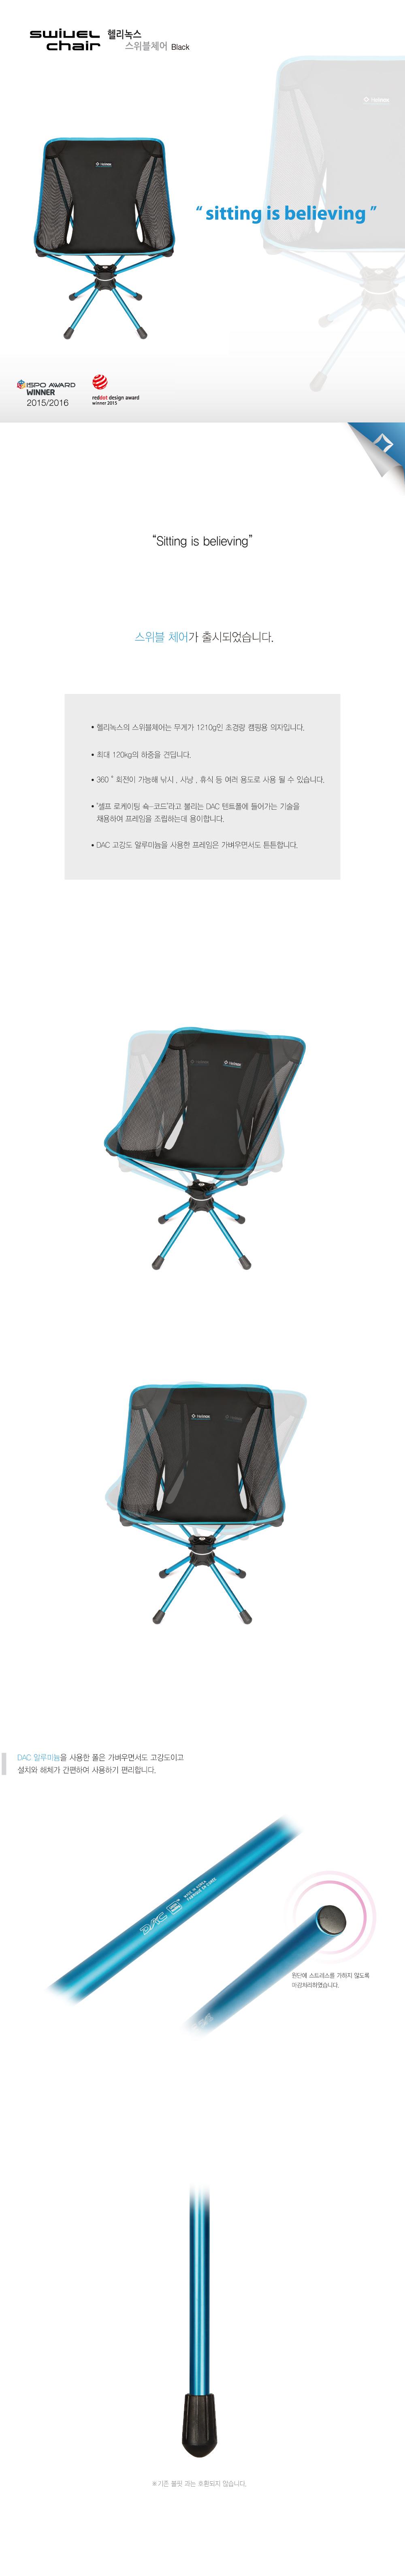 20150324-Helinox_swivel-chair-상세페이지-1_수정.jpg